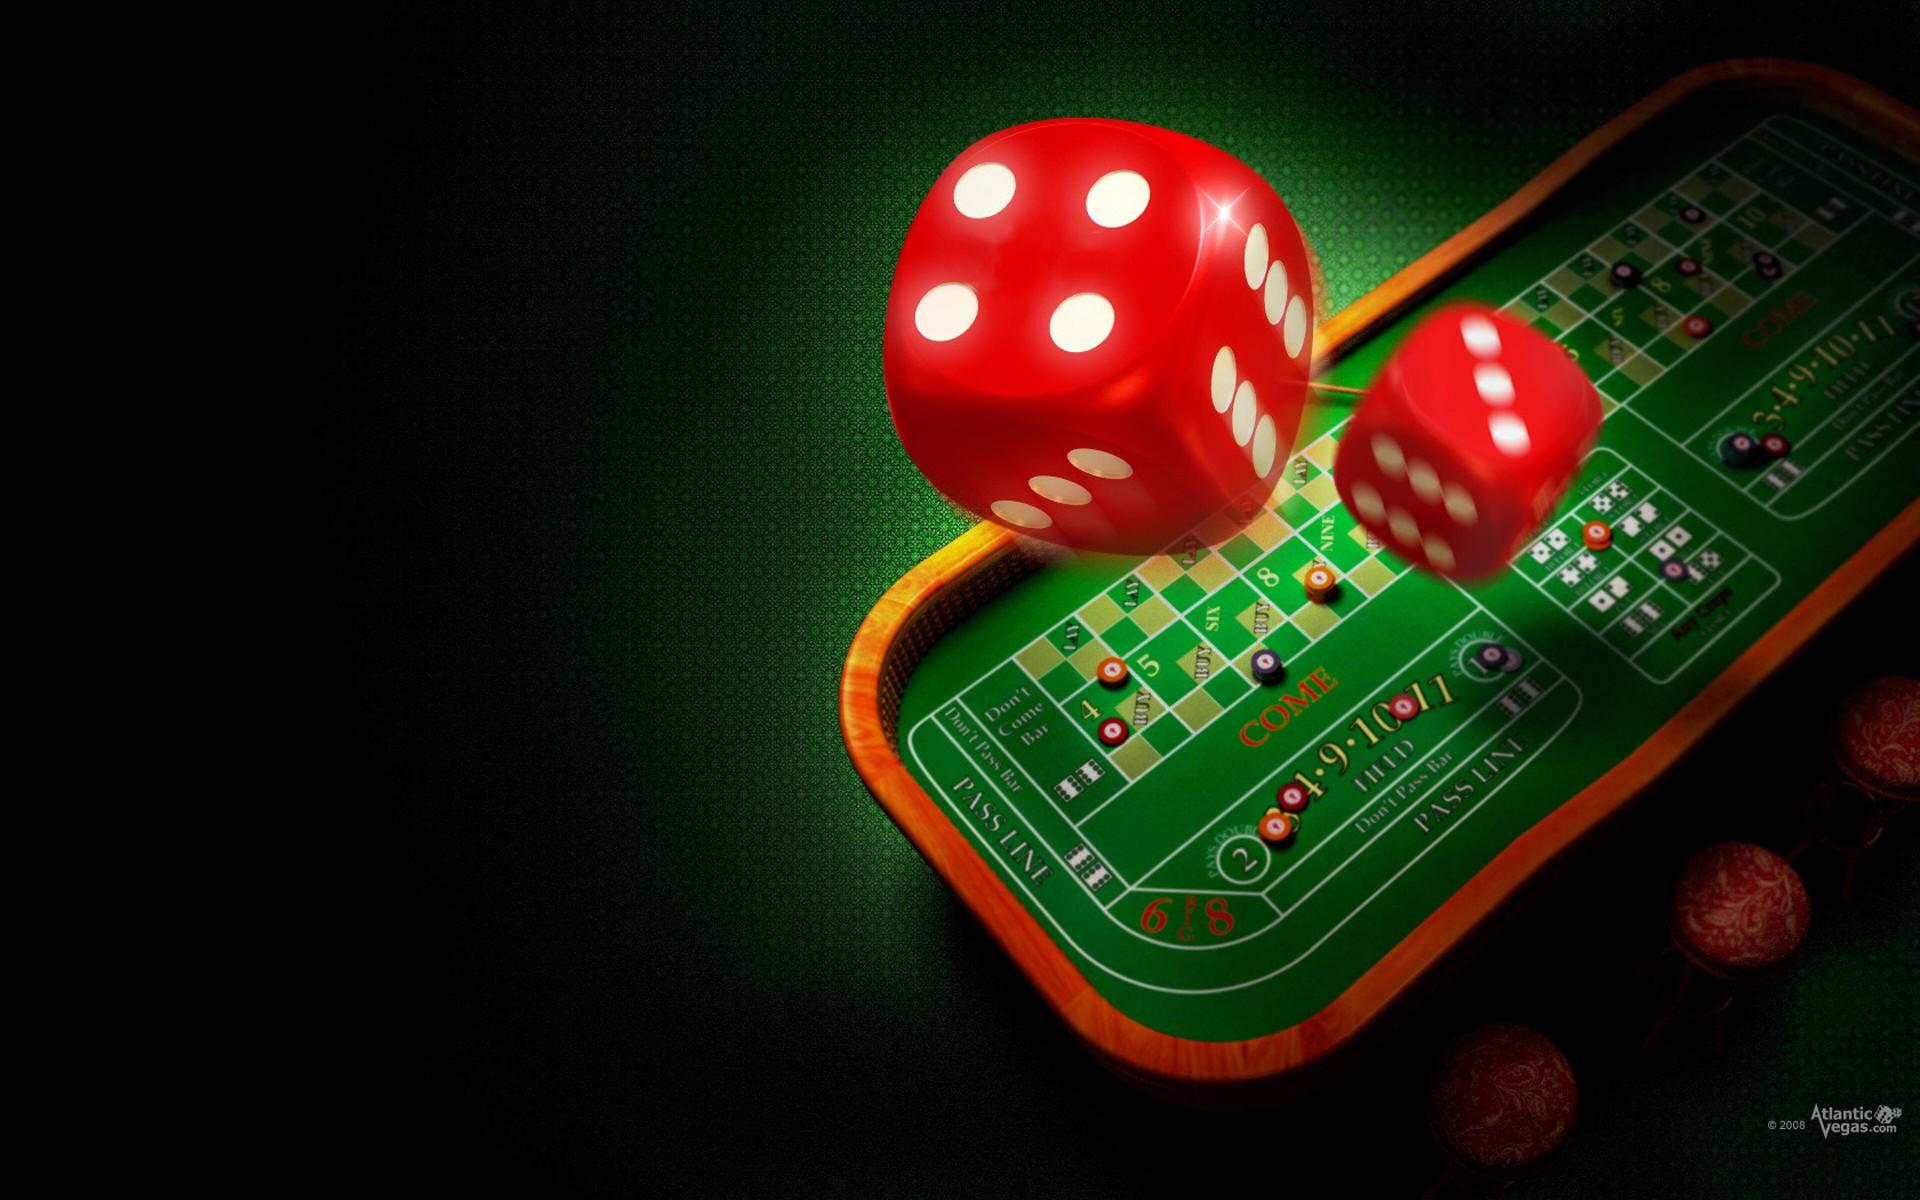 Gambling Apple Iphone Applications